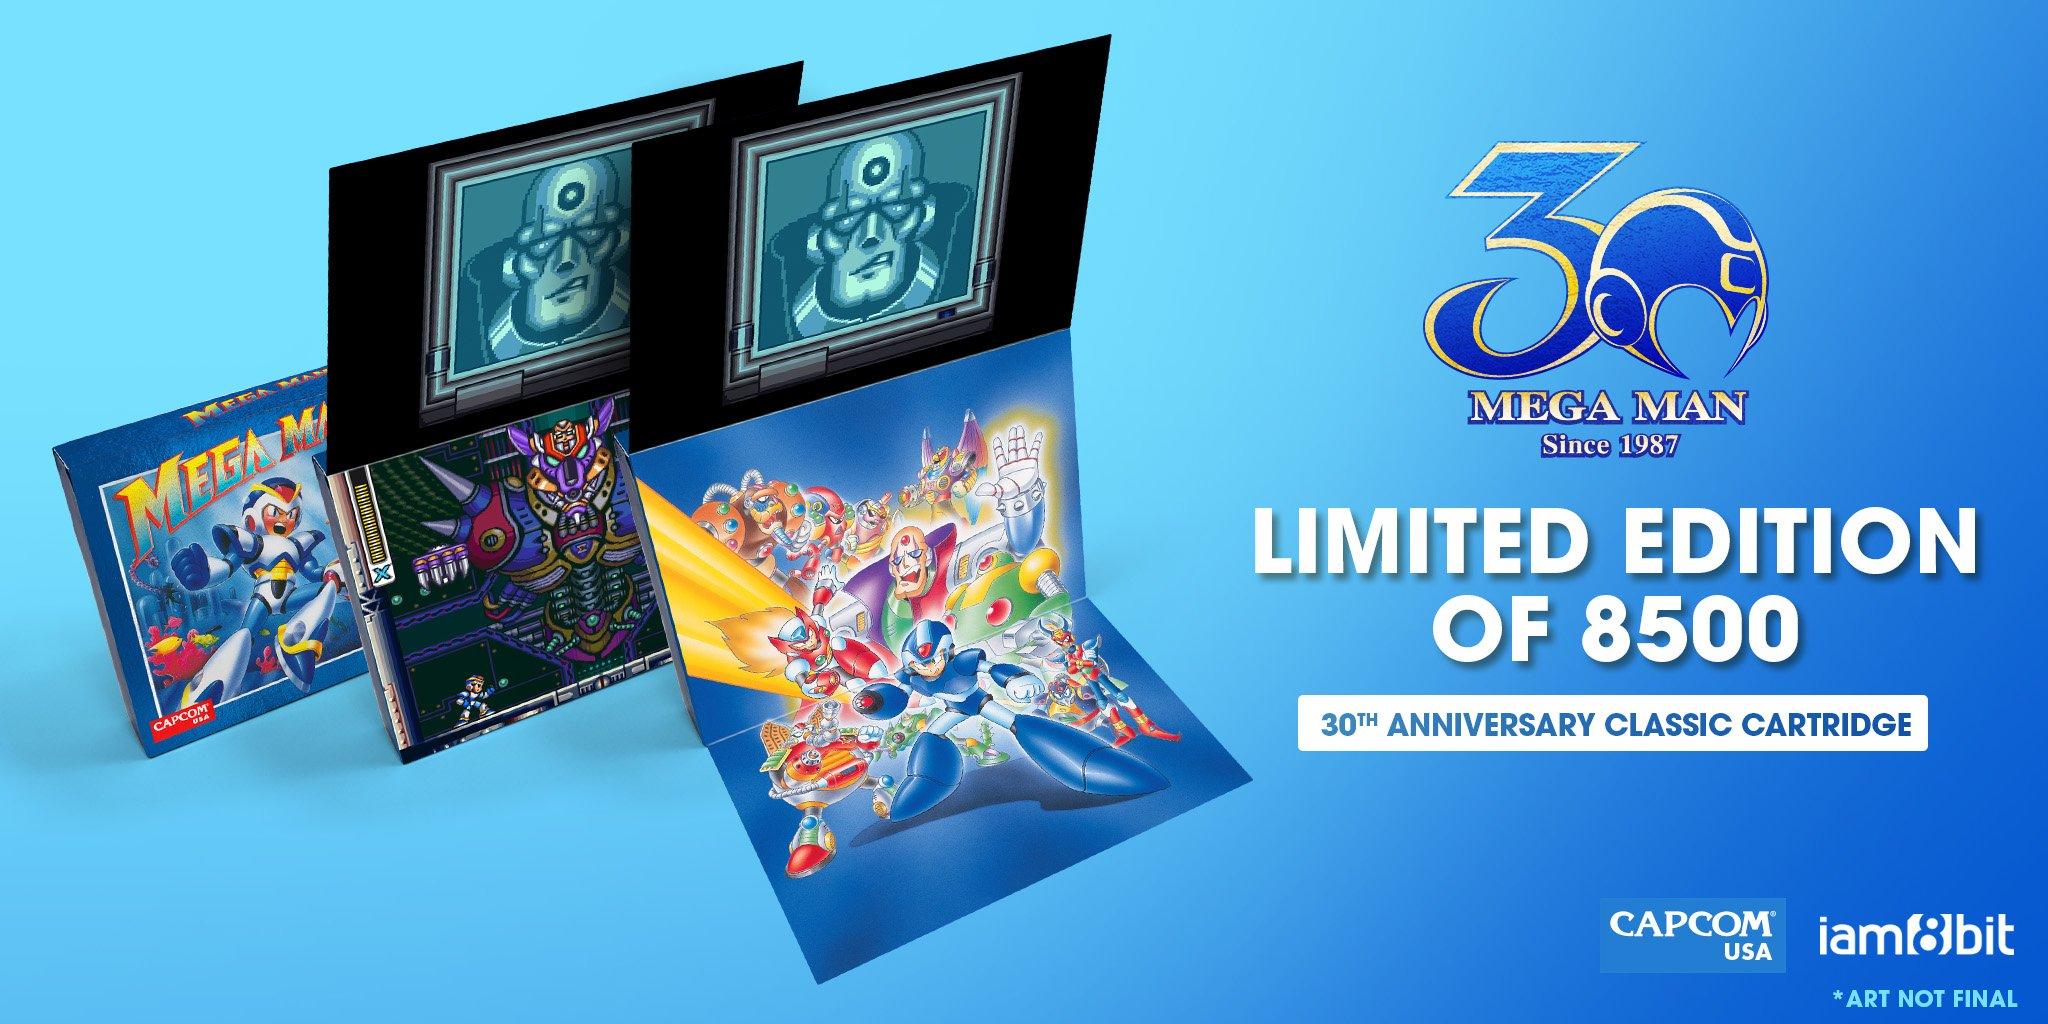 05-Mega_Man_2-30th_Anniversary_Classic_Cartridge_41d2f5b5-5561-41d6-aceb-9612b94324e3.jpg